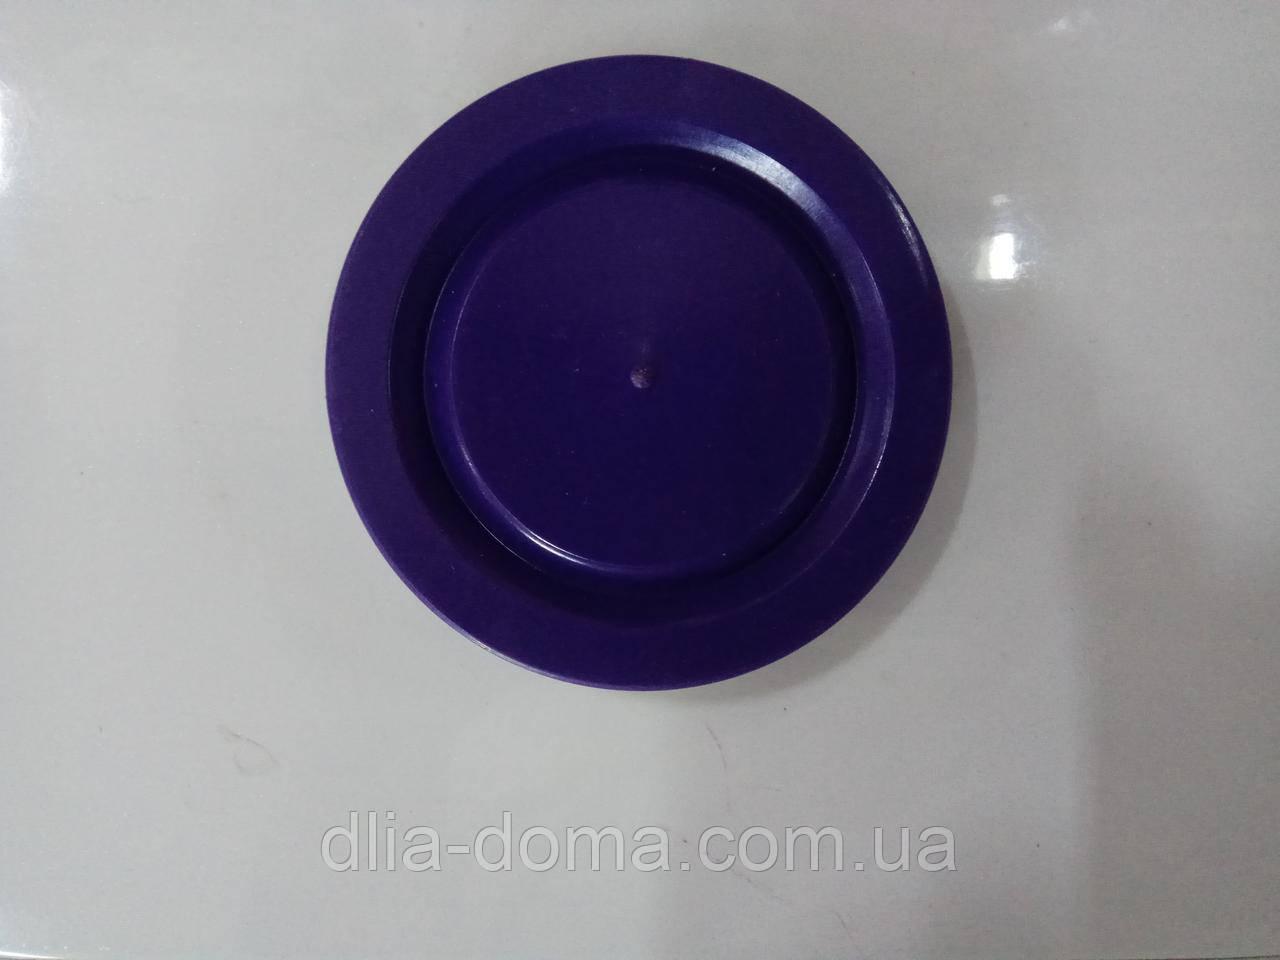 Крышка хозяйственная для банок цветная